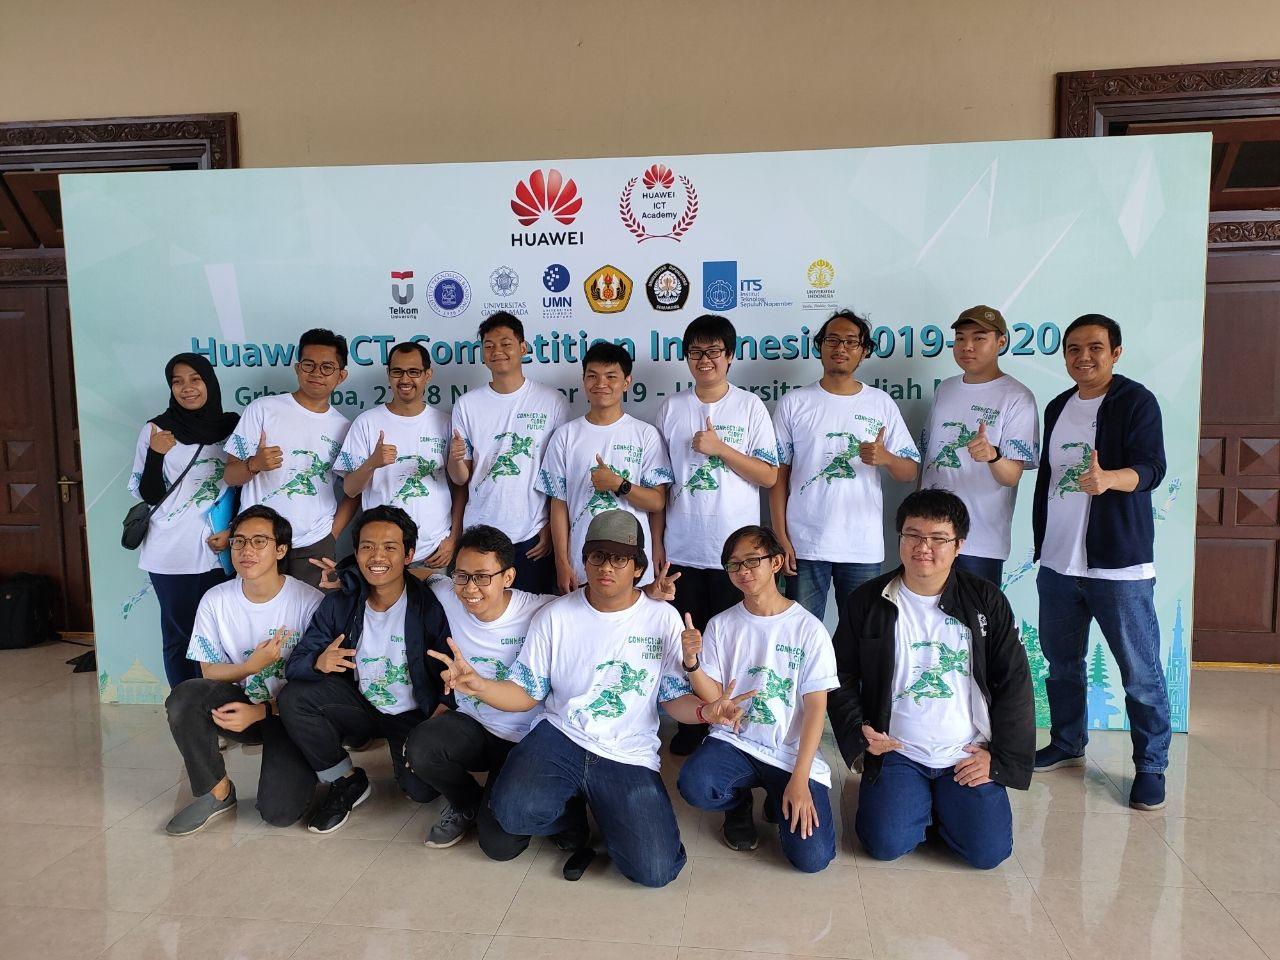 ITB Lolos ke Babak Final Huawei ICT Competition Tingkat Dunia